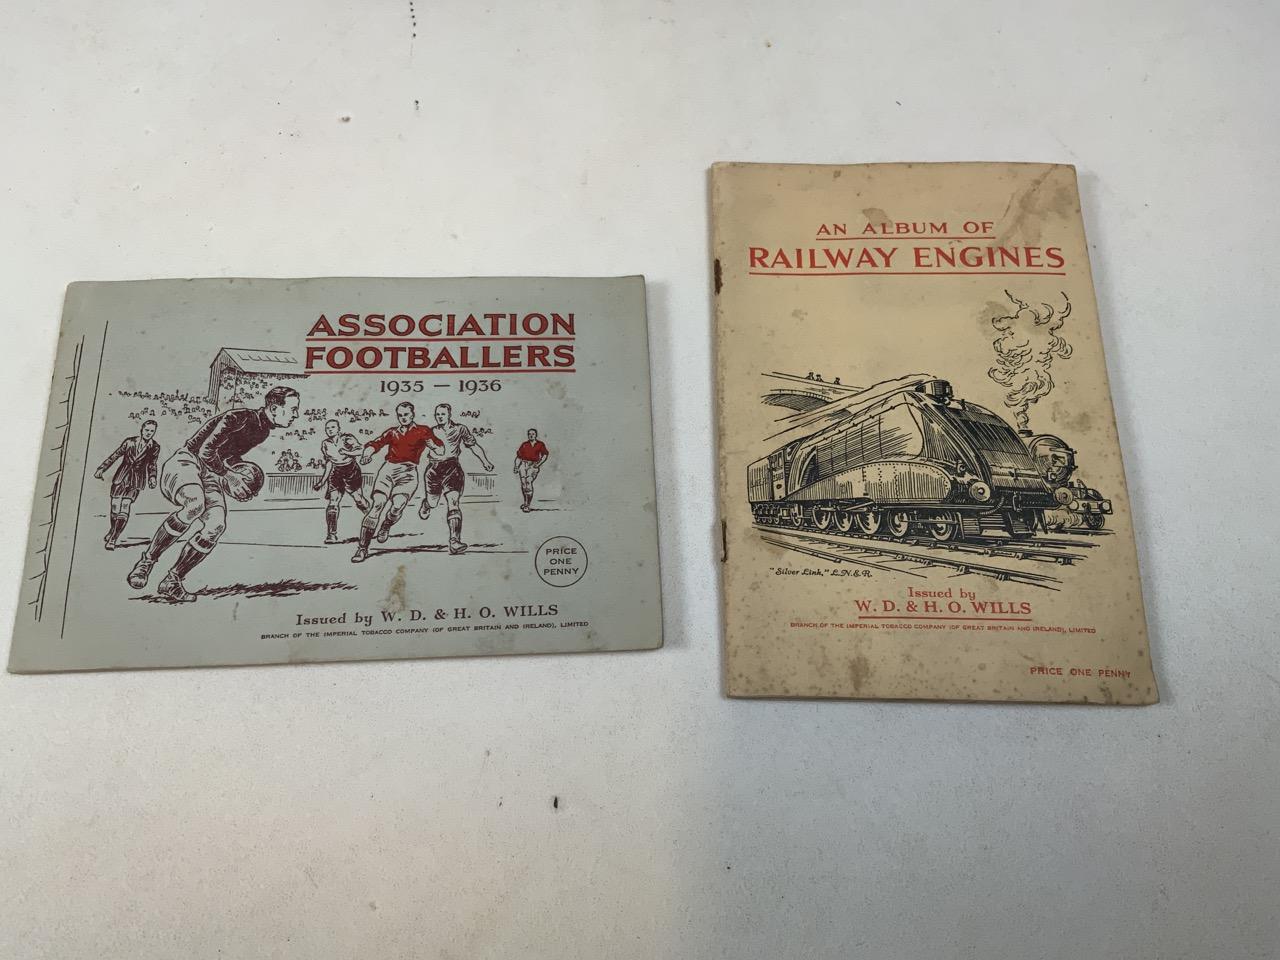 Nine cigarette card albums including Association footballers 1935-1936, Radio celebrities, An - Image 2 of 5